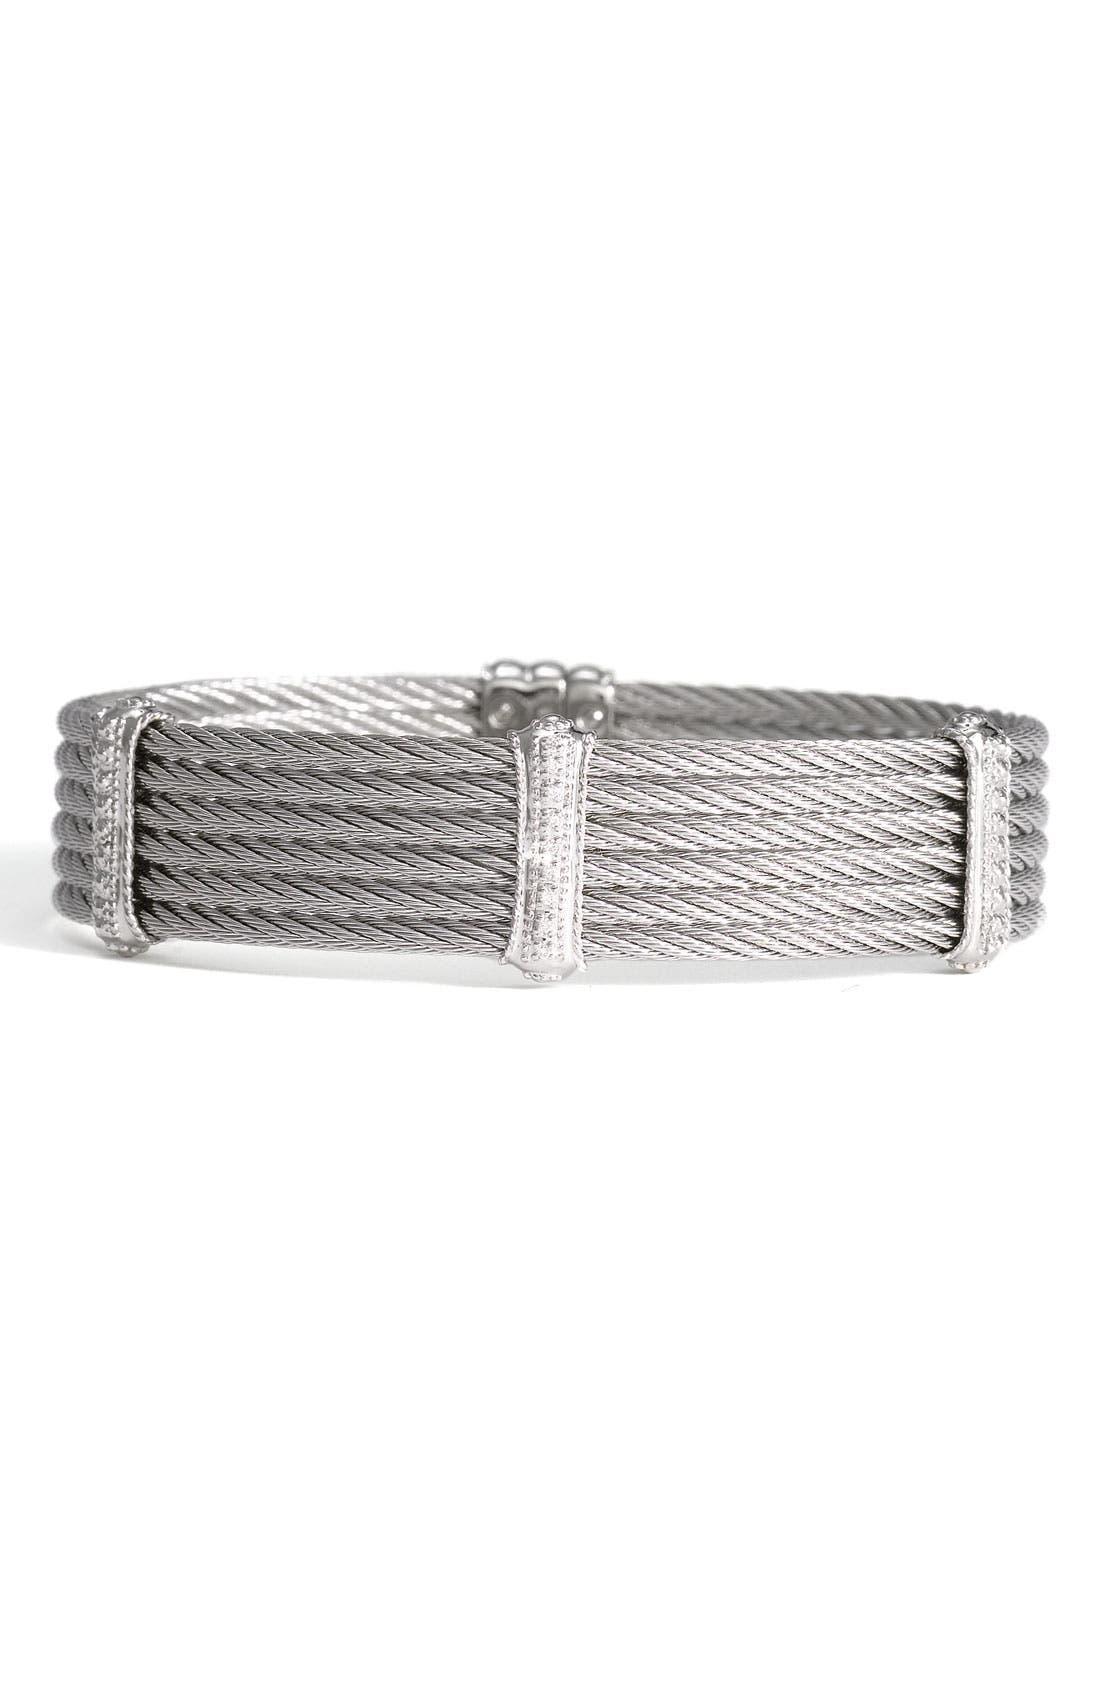 Alternate Image 1 Selected - ALOR® 6-Row Bracelet